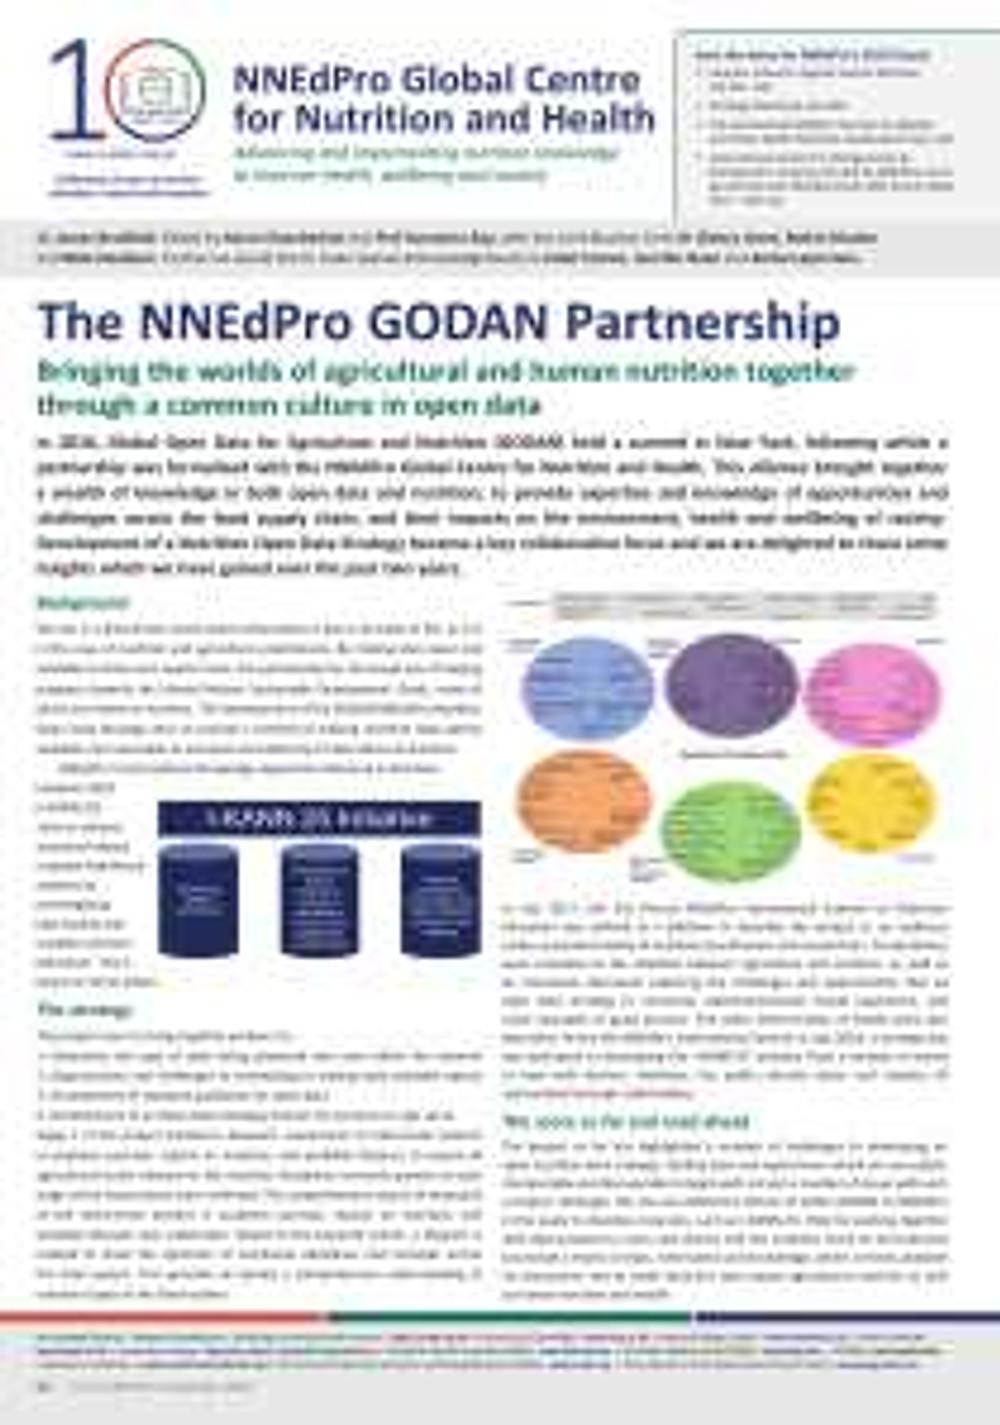 article_CN-nnedpro_8_Nov18_TheNNedProGODANPartnership_FINAL-web-1